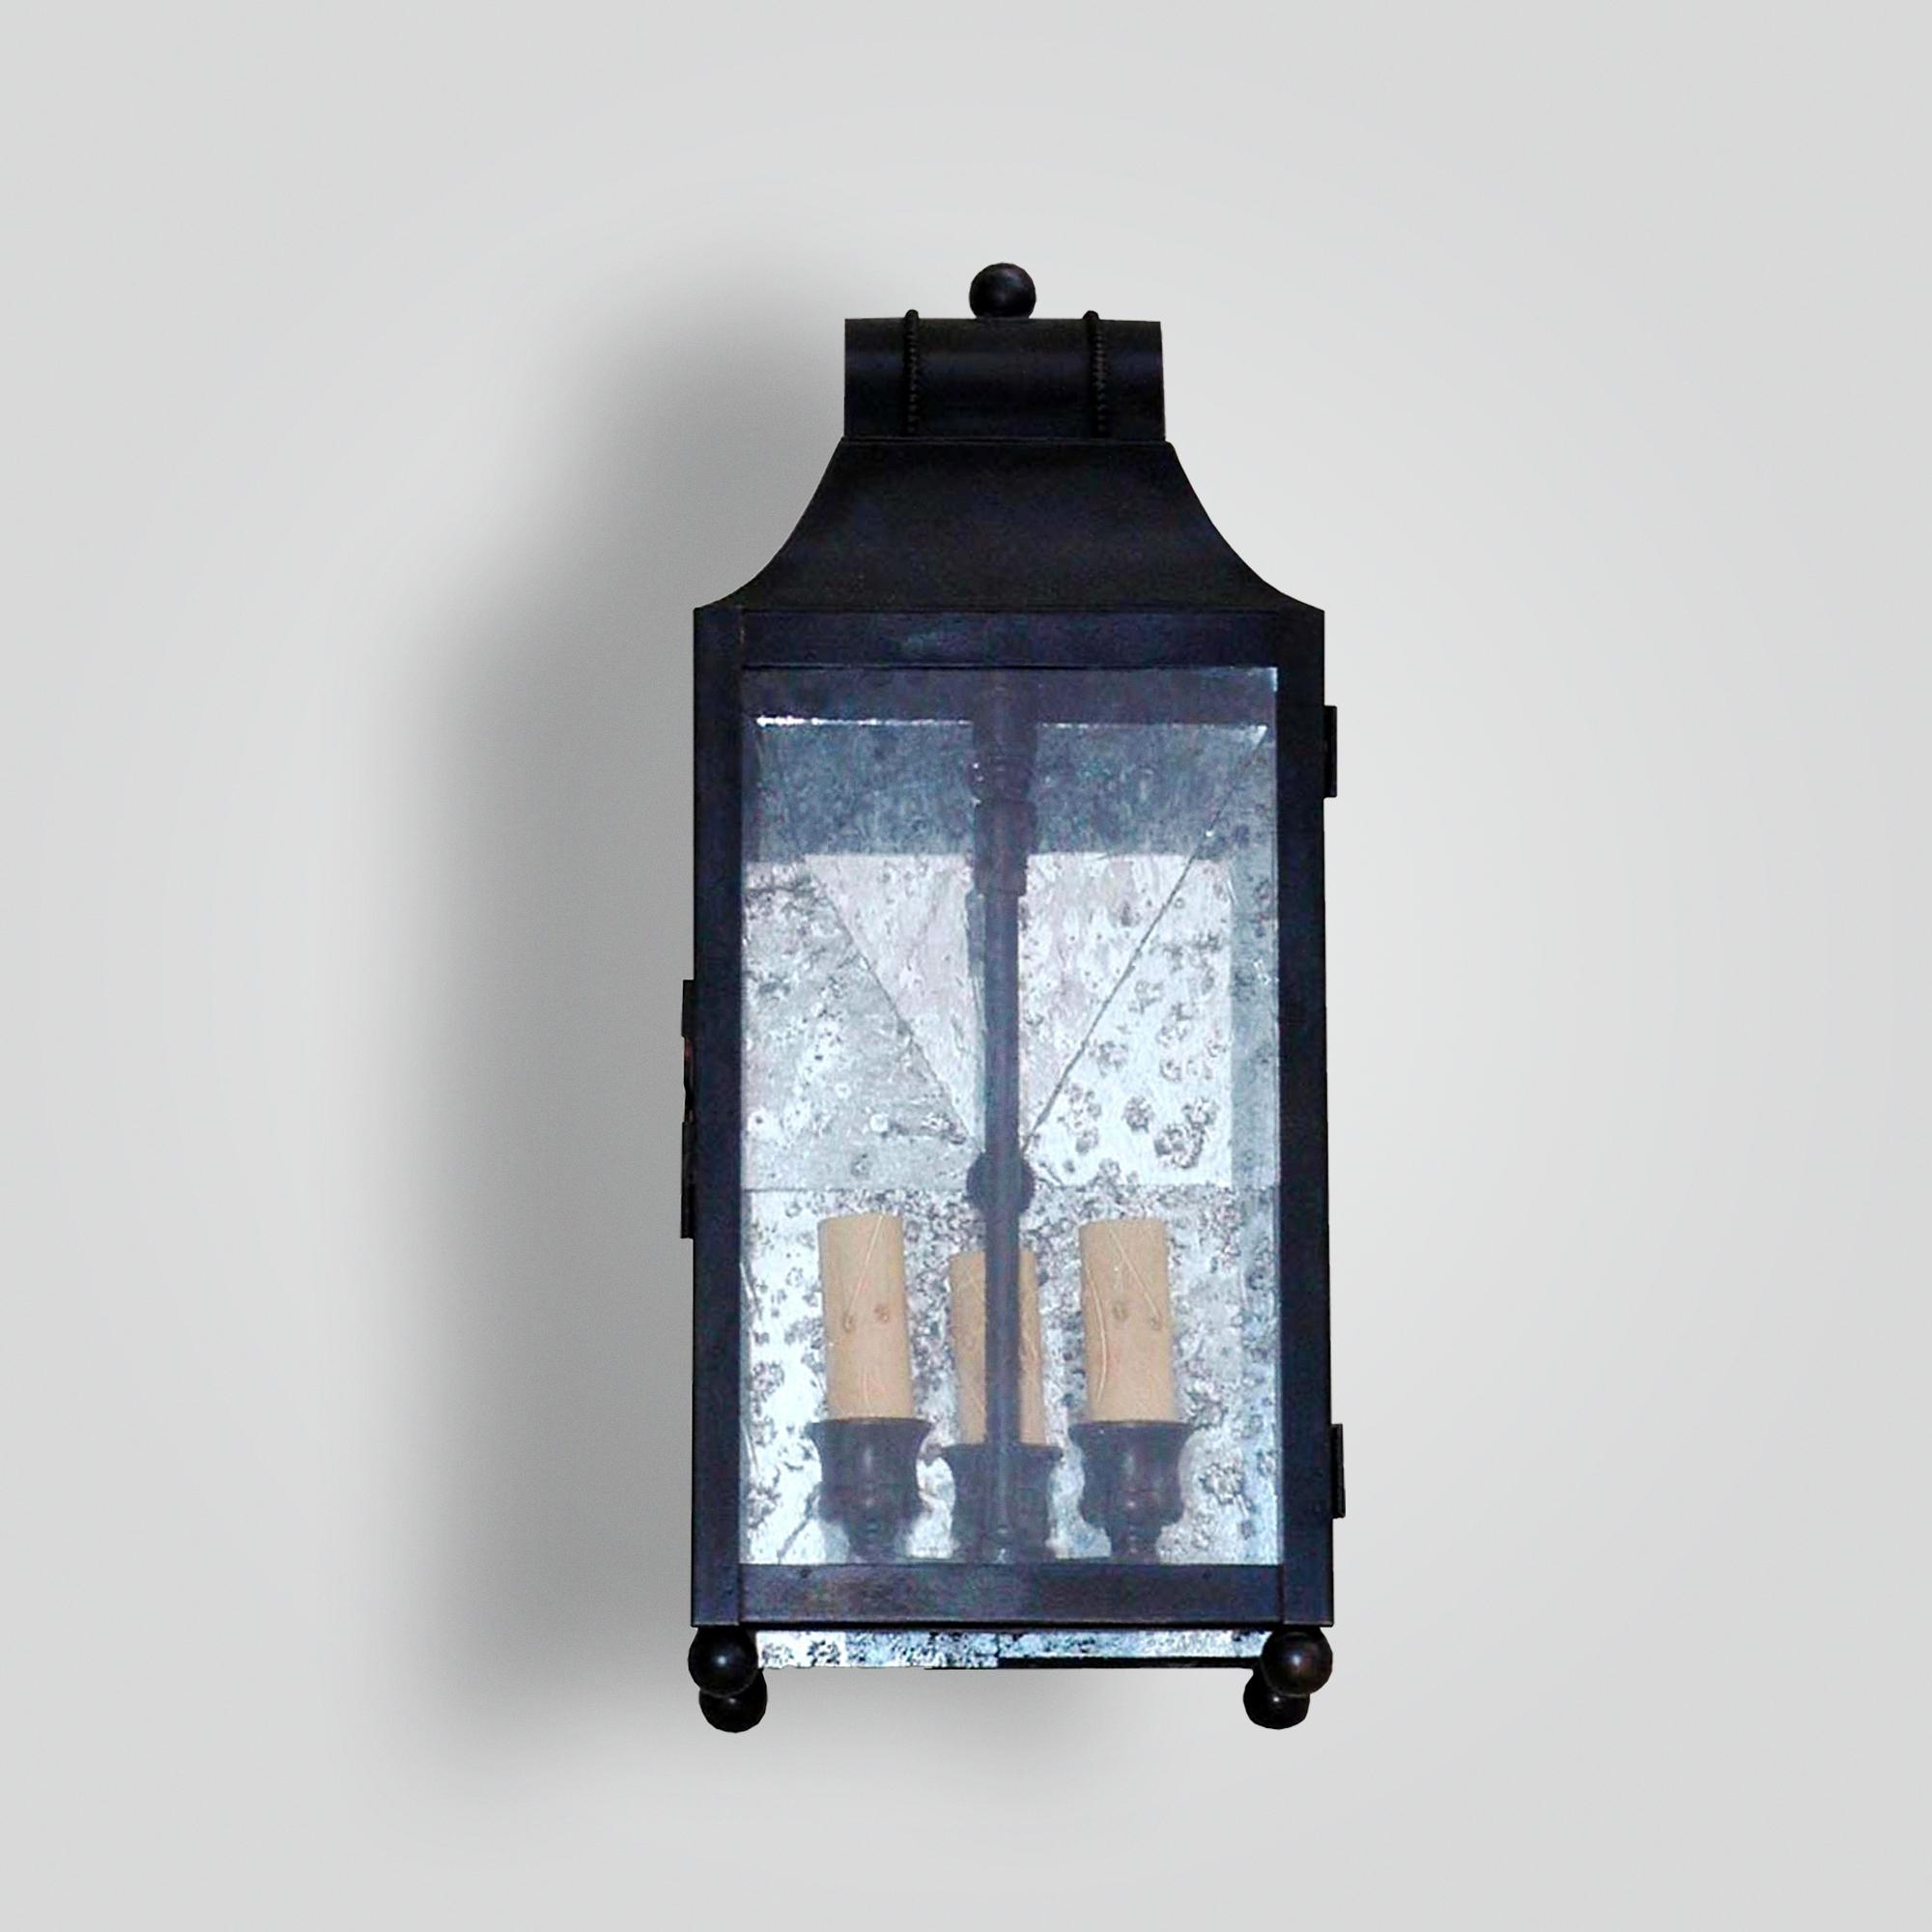 526-cb3-br-w-sh Brass Lantern Antiqued Mirror Glass Back – ADG Lighting Collection